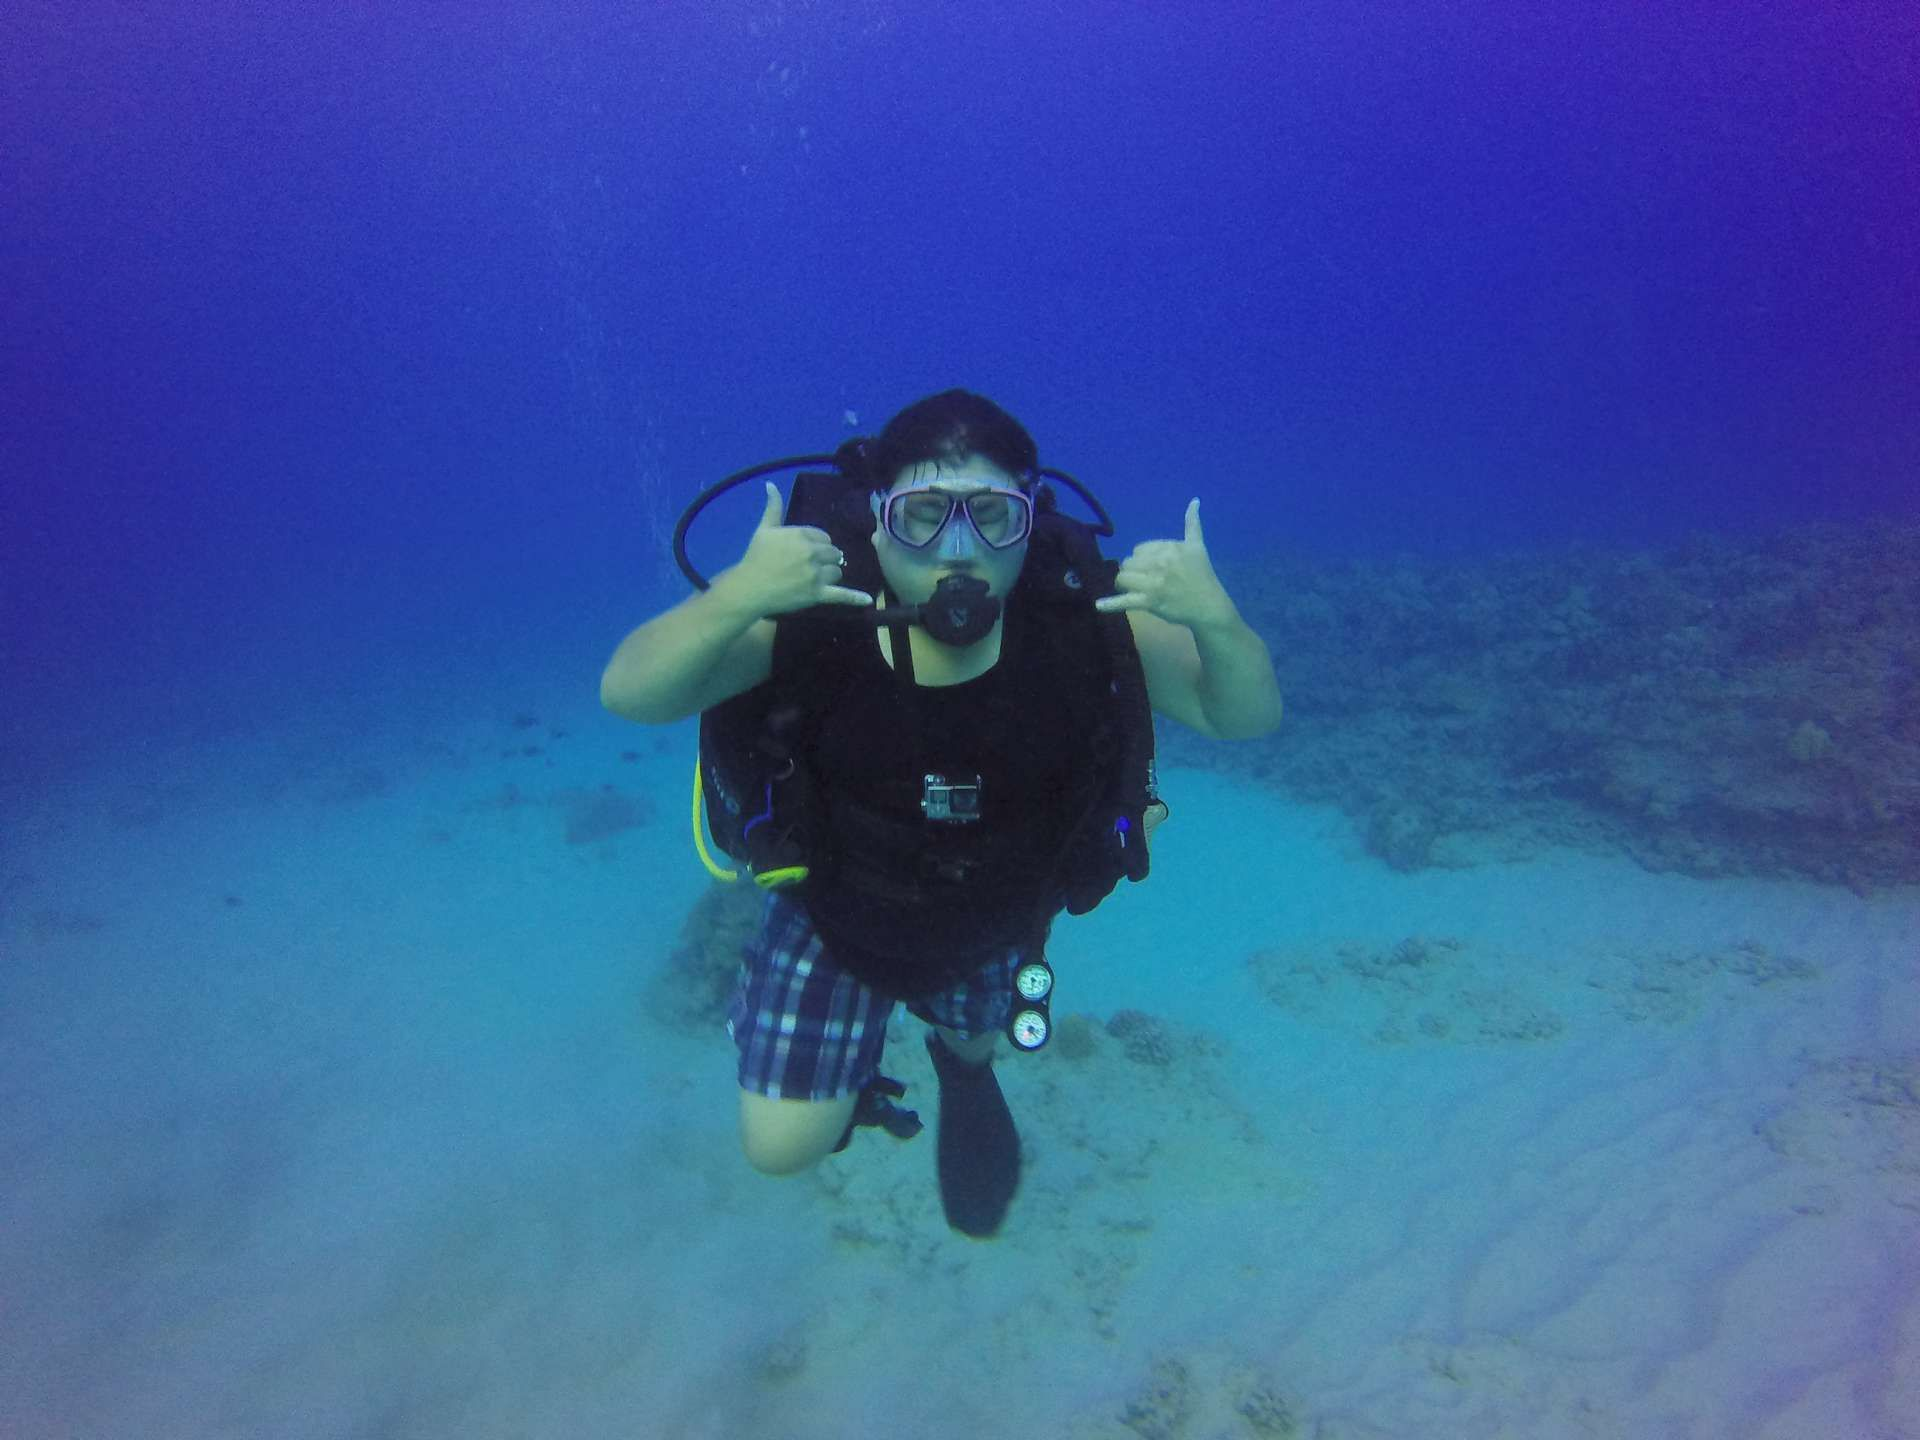 #hawaii #scuba http://rainbowscuba.com/hawaii-scuba-prices.html @rainbowscuba